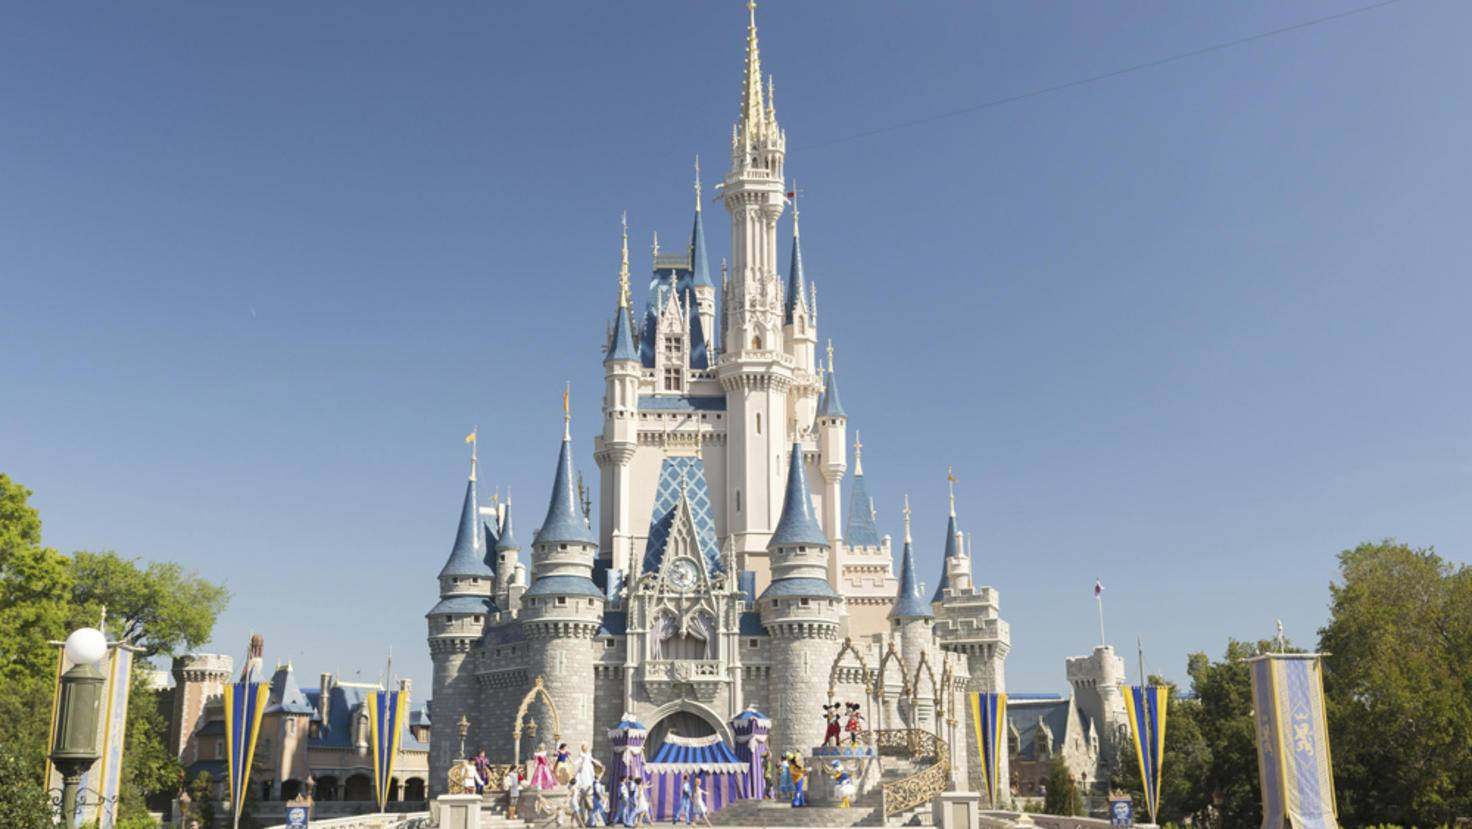 Walt Disney World Florida-picture alliance-imageBROKER-108661762